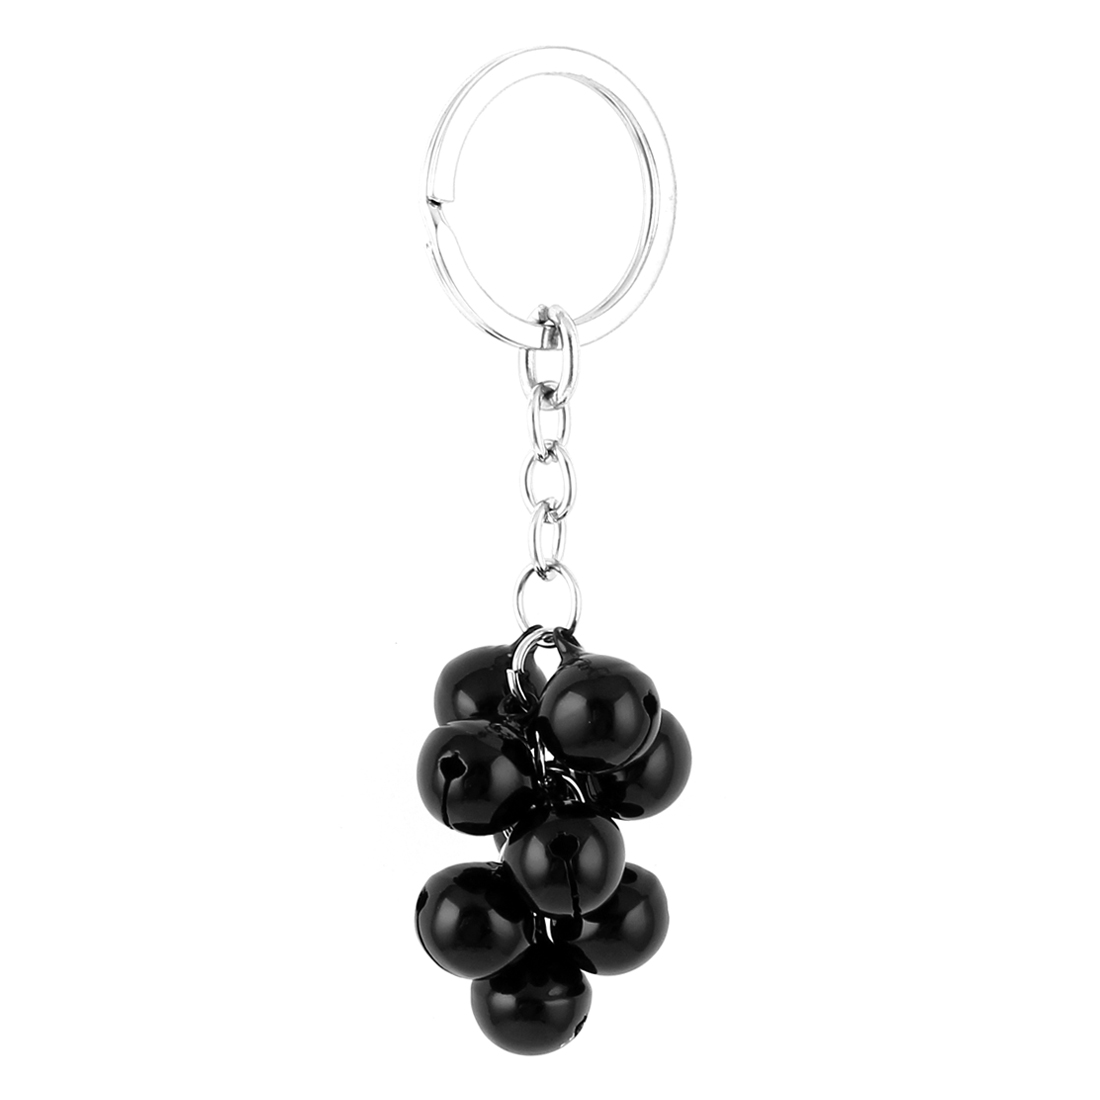 Black Metal Bells Pendant Split Ring Keyring Keychain Key Chain Handbag Purse Ornament